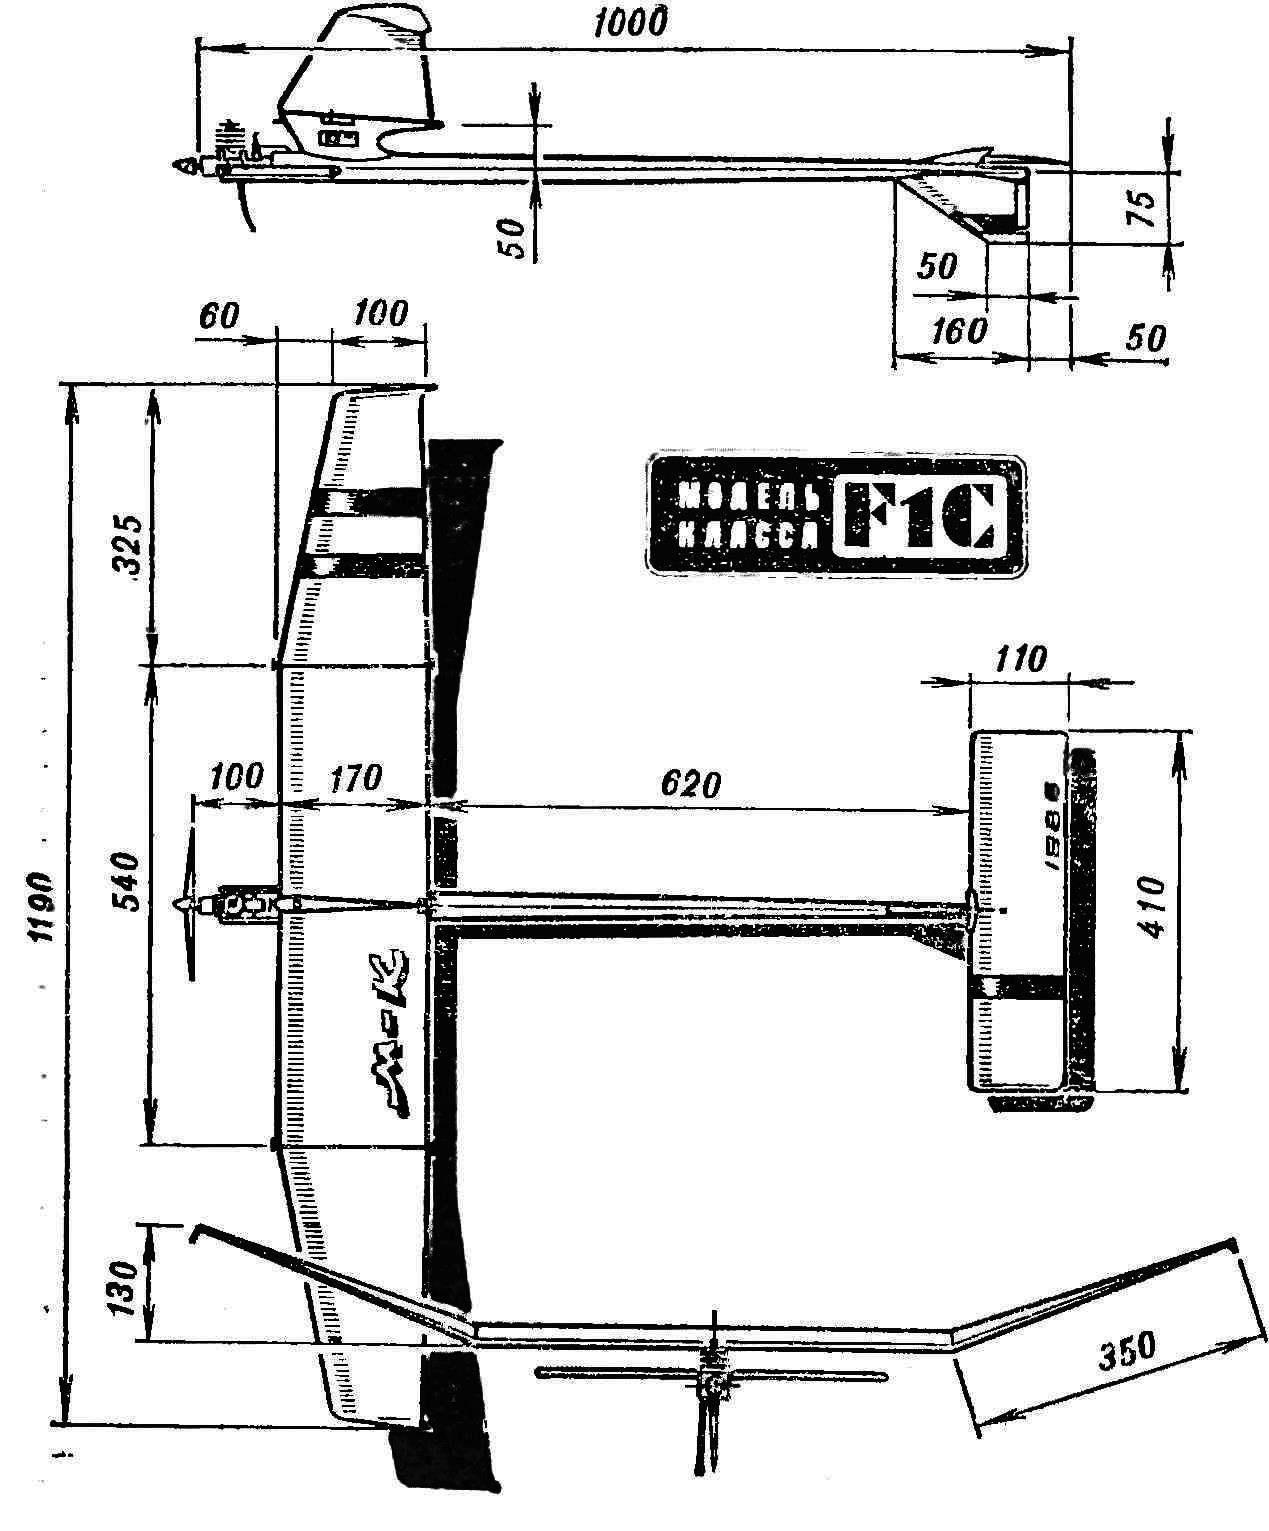 Fig. 1. Timeria svobodata model airplane engine working volume of 1.5 cm3